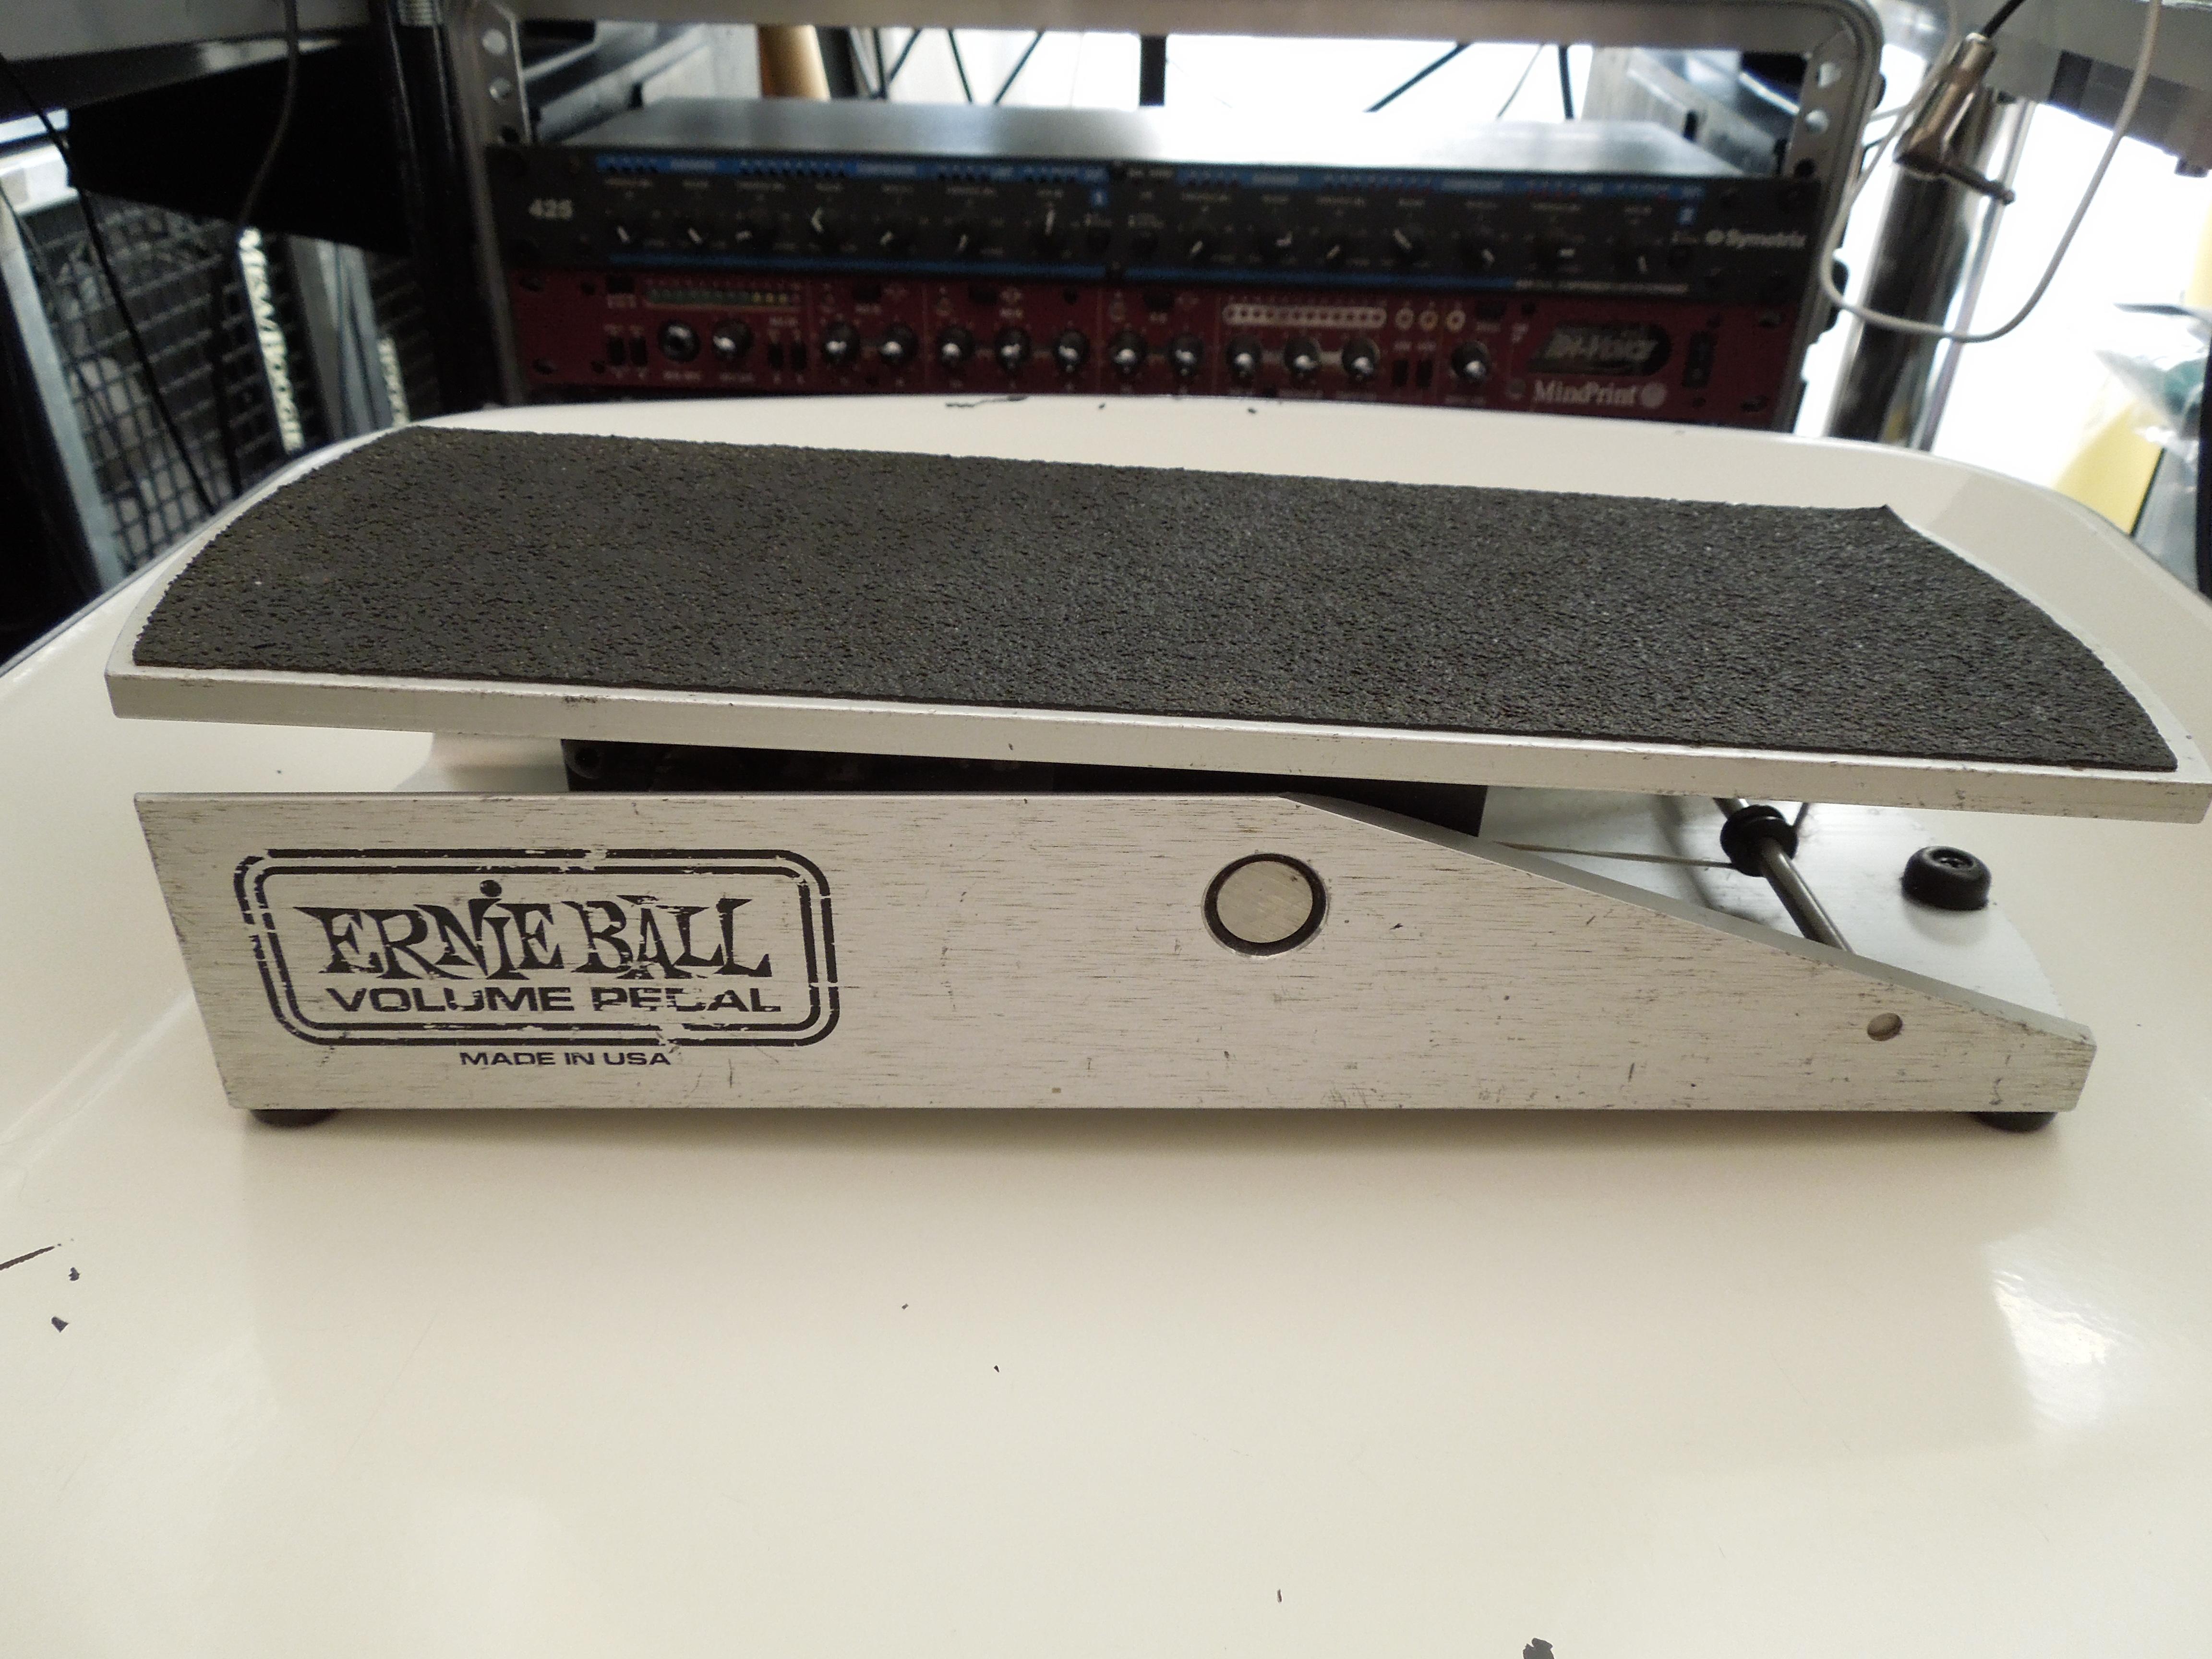 Ernie Ball 6166 : ernie ball 6166 250k mono volume pedal for use with passive electronics image 472281 ~ Russianpoet.info Haus und Dekorationen